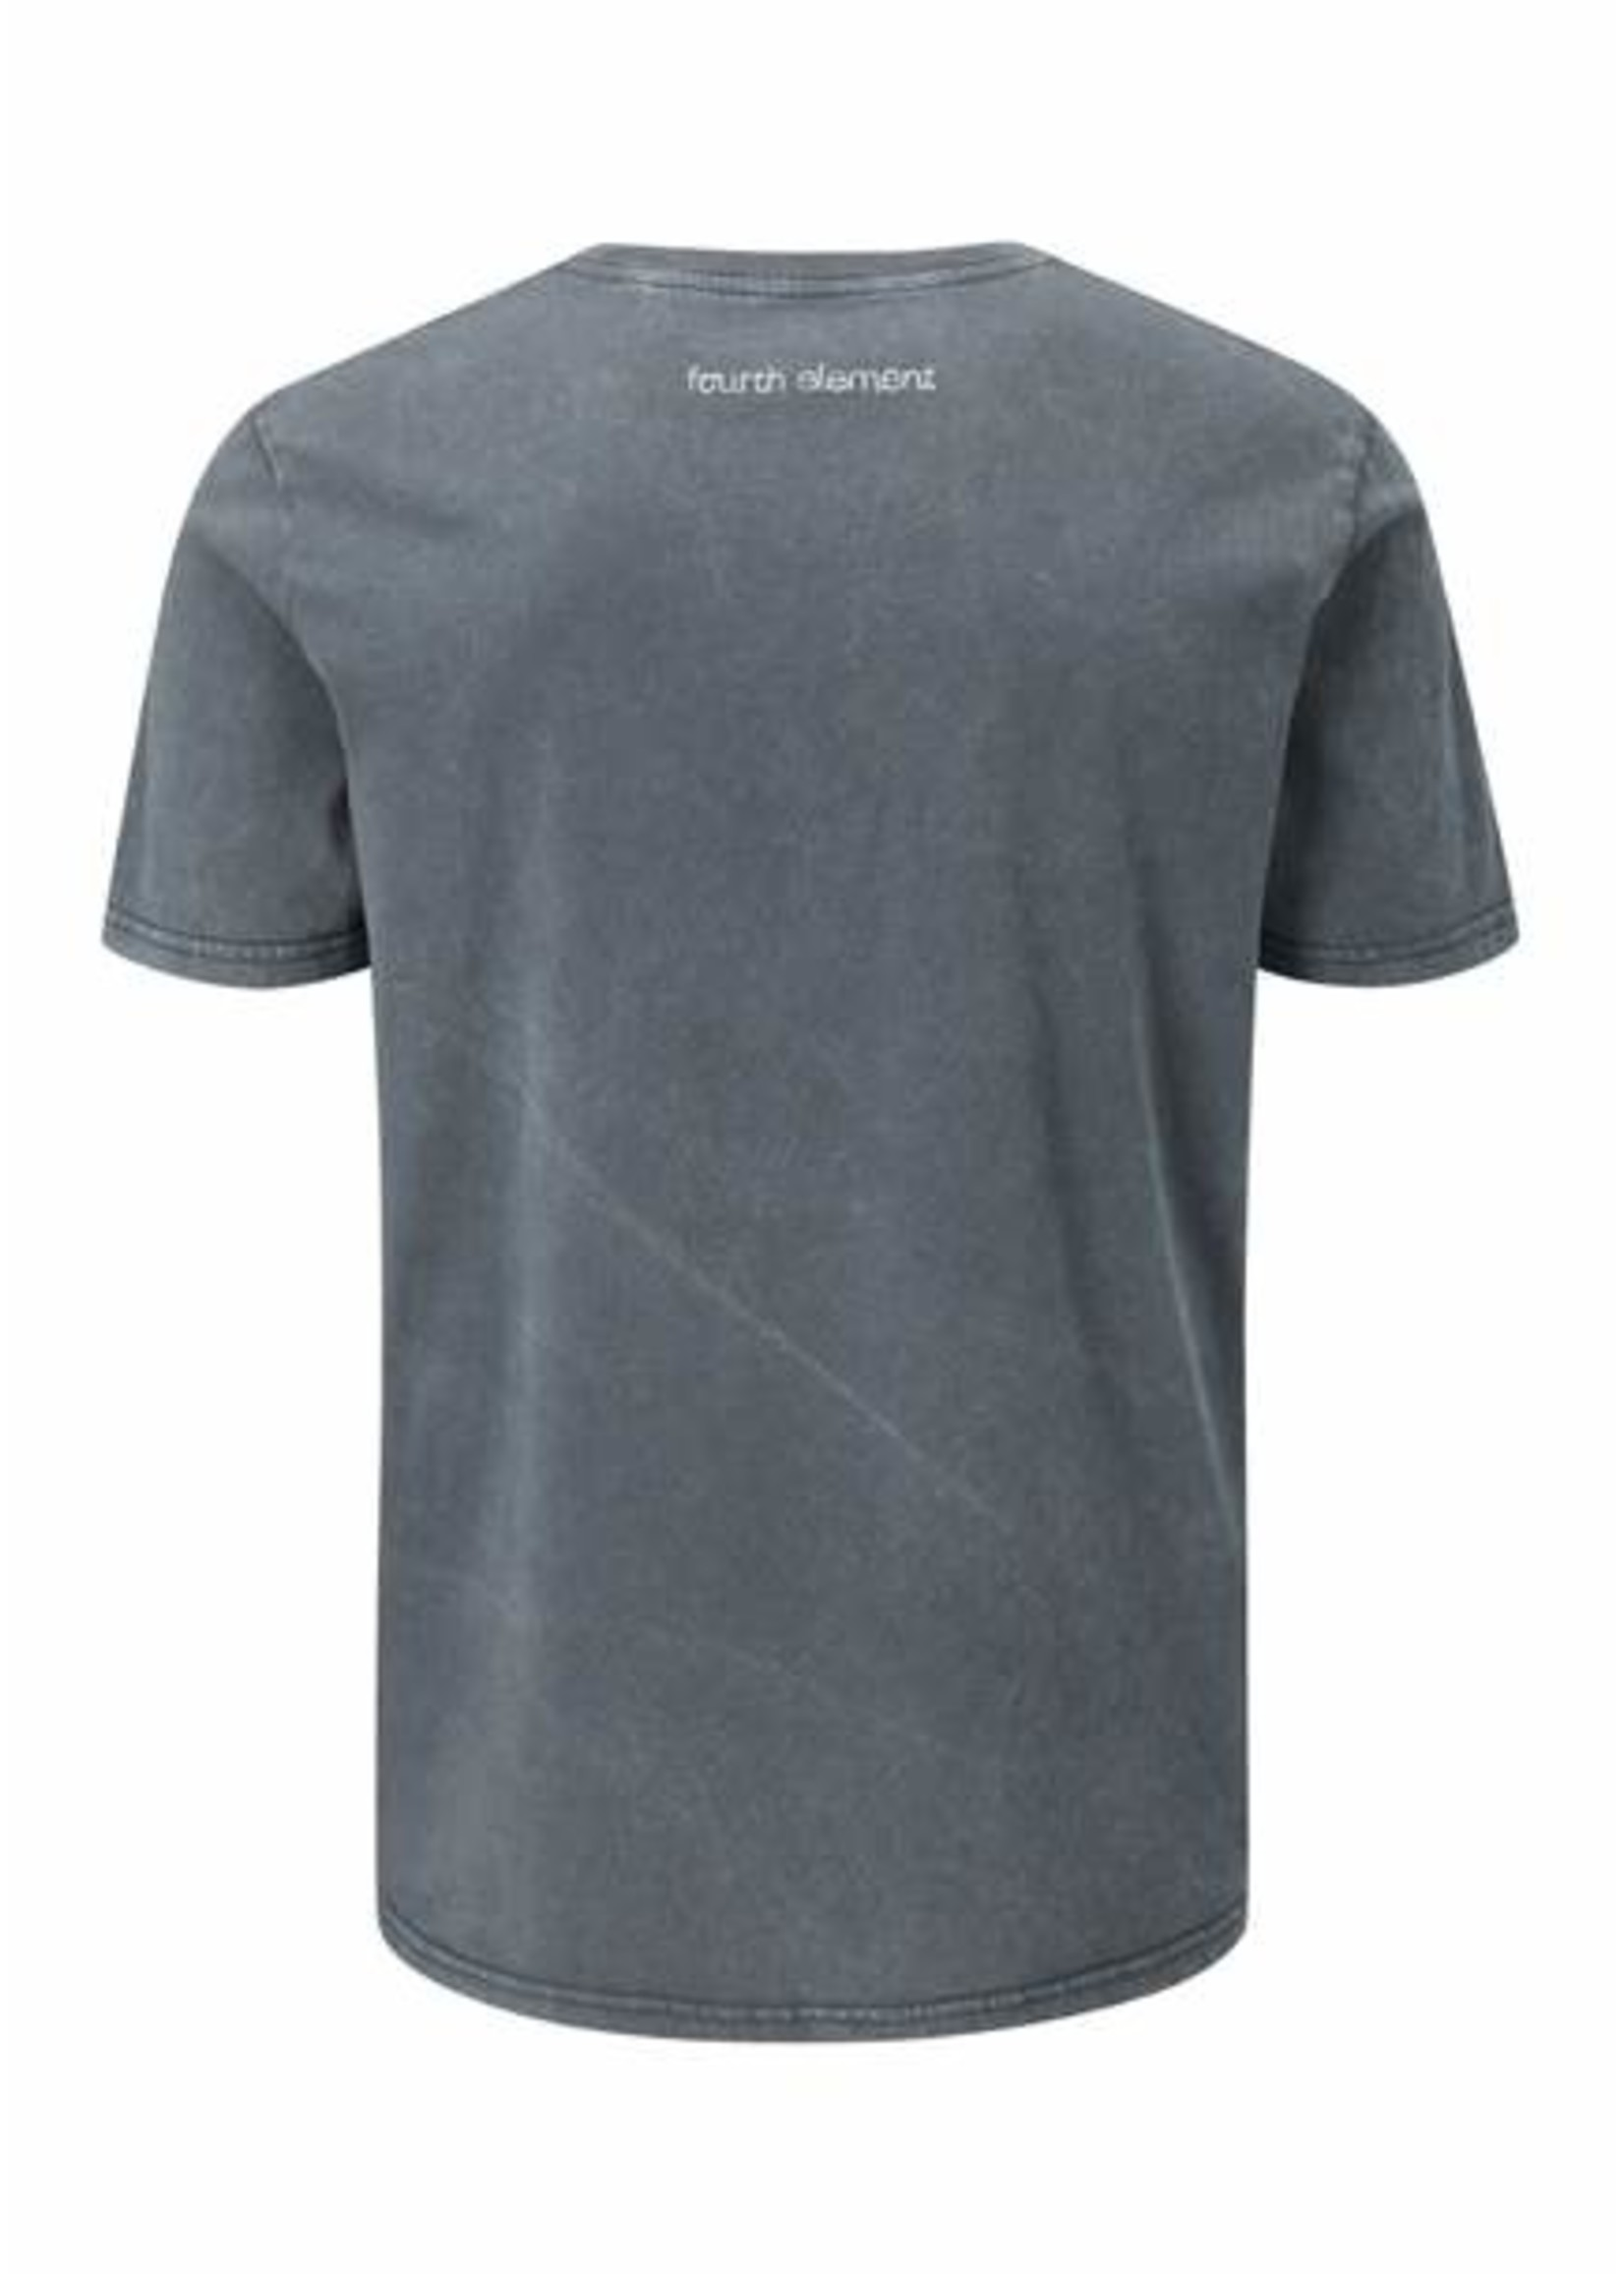 Fourth Element Fourth Element Lifeline Vintage T-Shirt - man